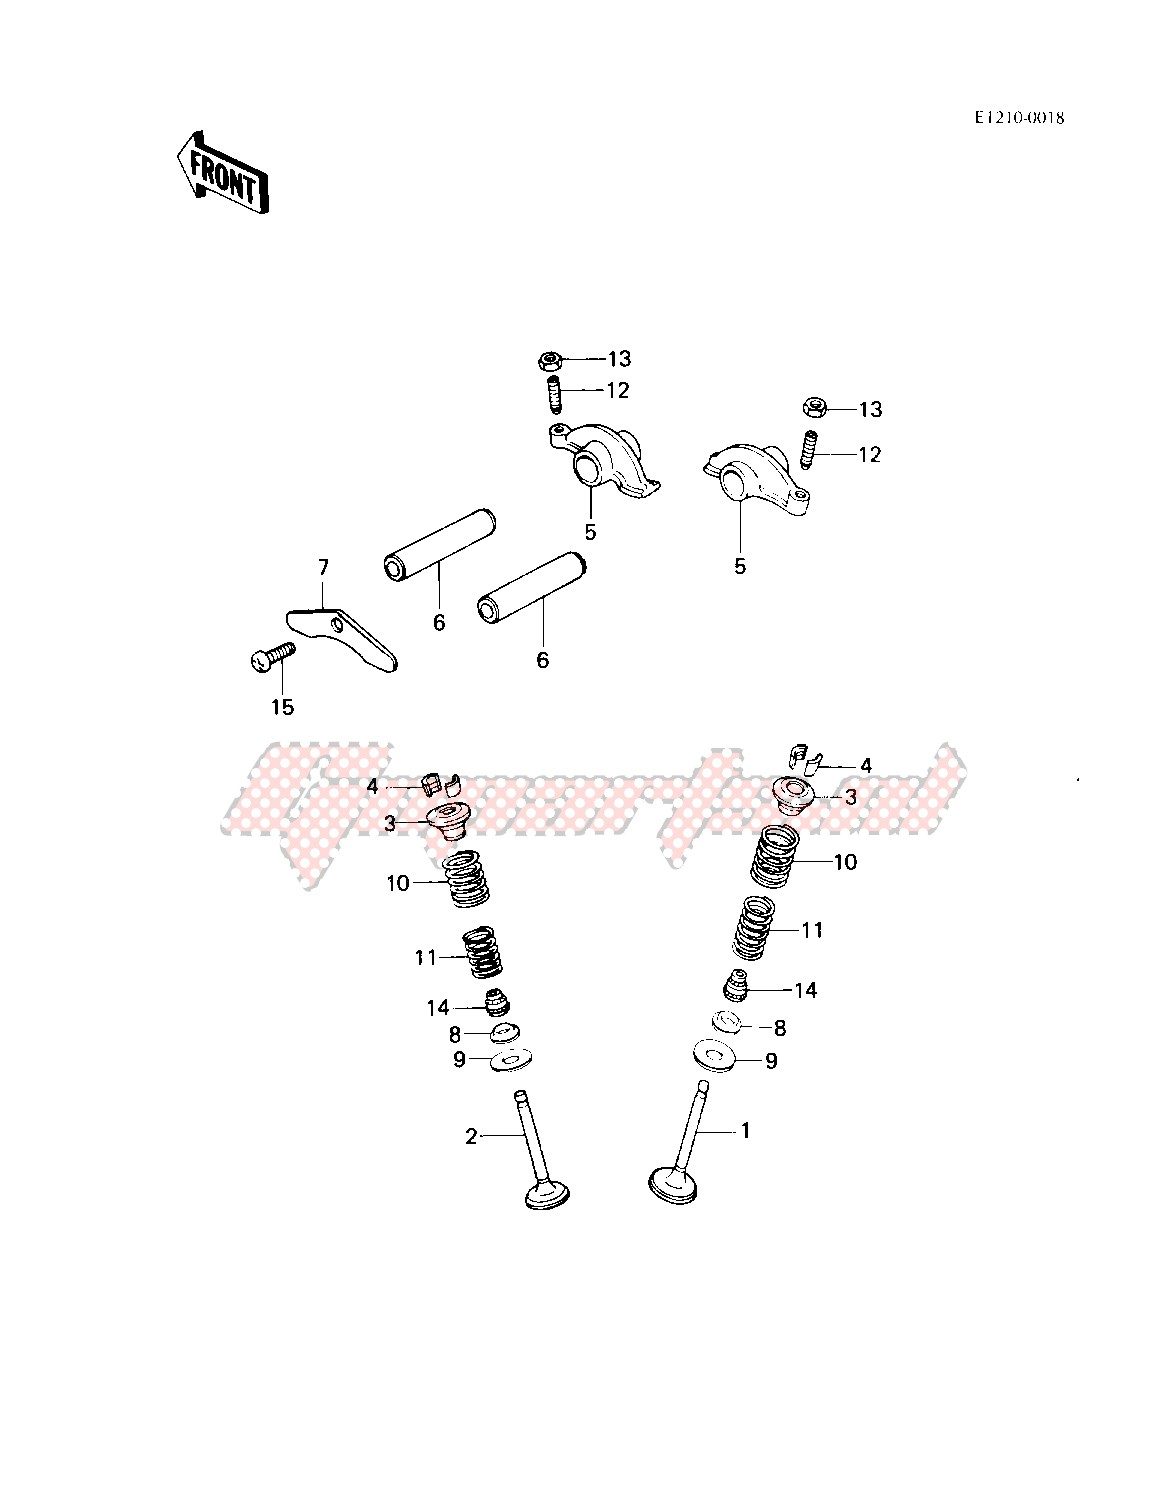 ROCKER ARMS_VALVES -- 83 KLT200-C1- - image